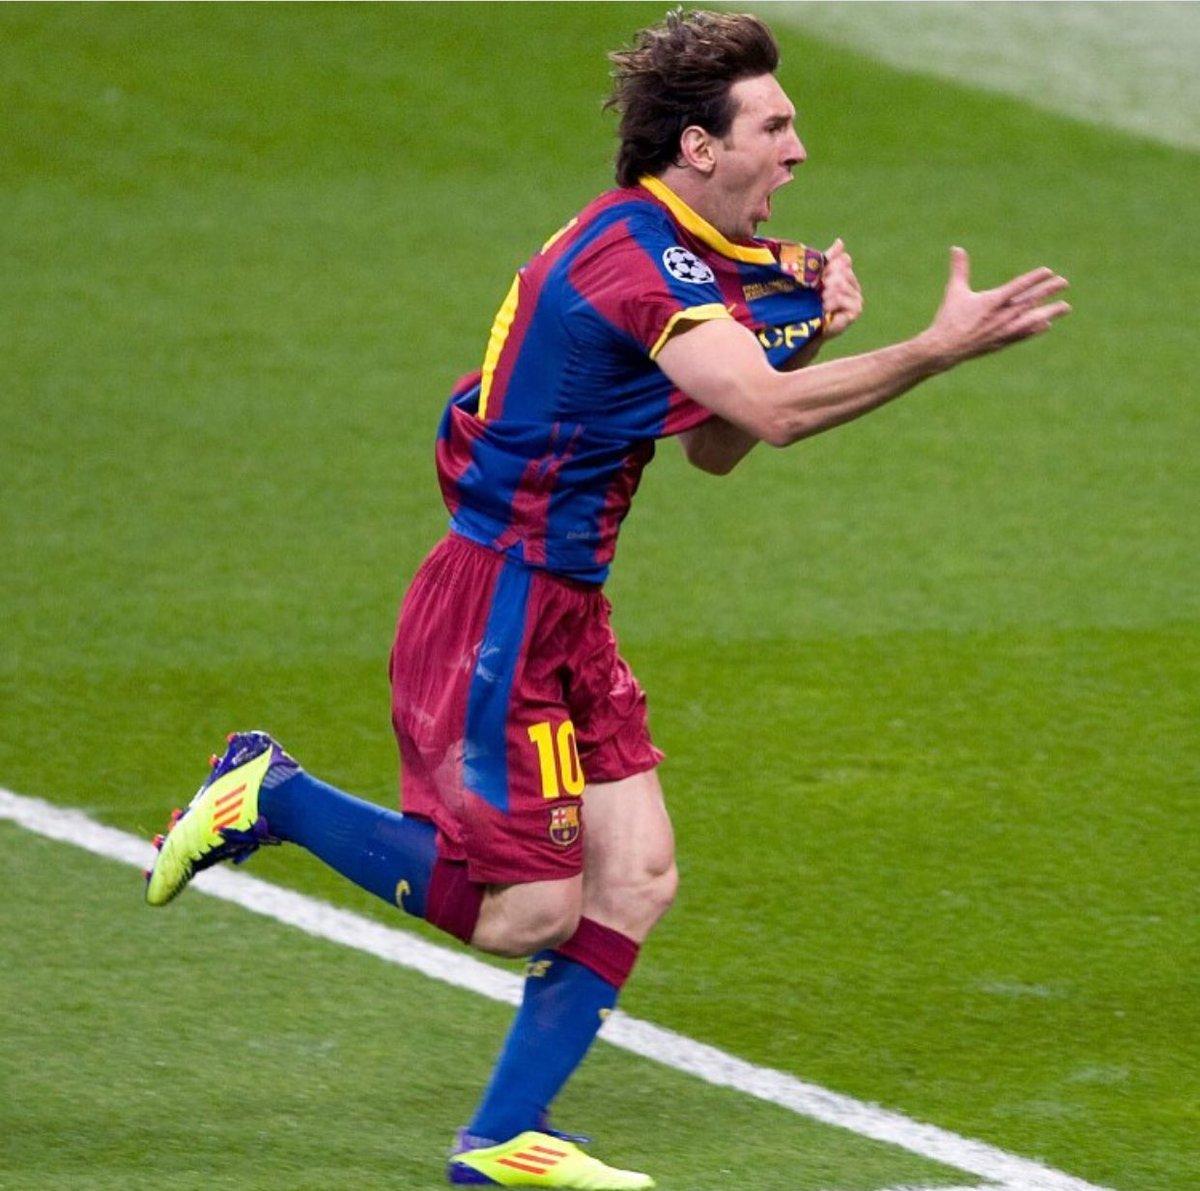 ¿Es Leo Messi Imposible? - Página 36 DGft2u5XgAY-aOO